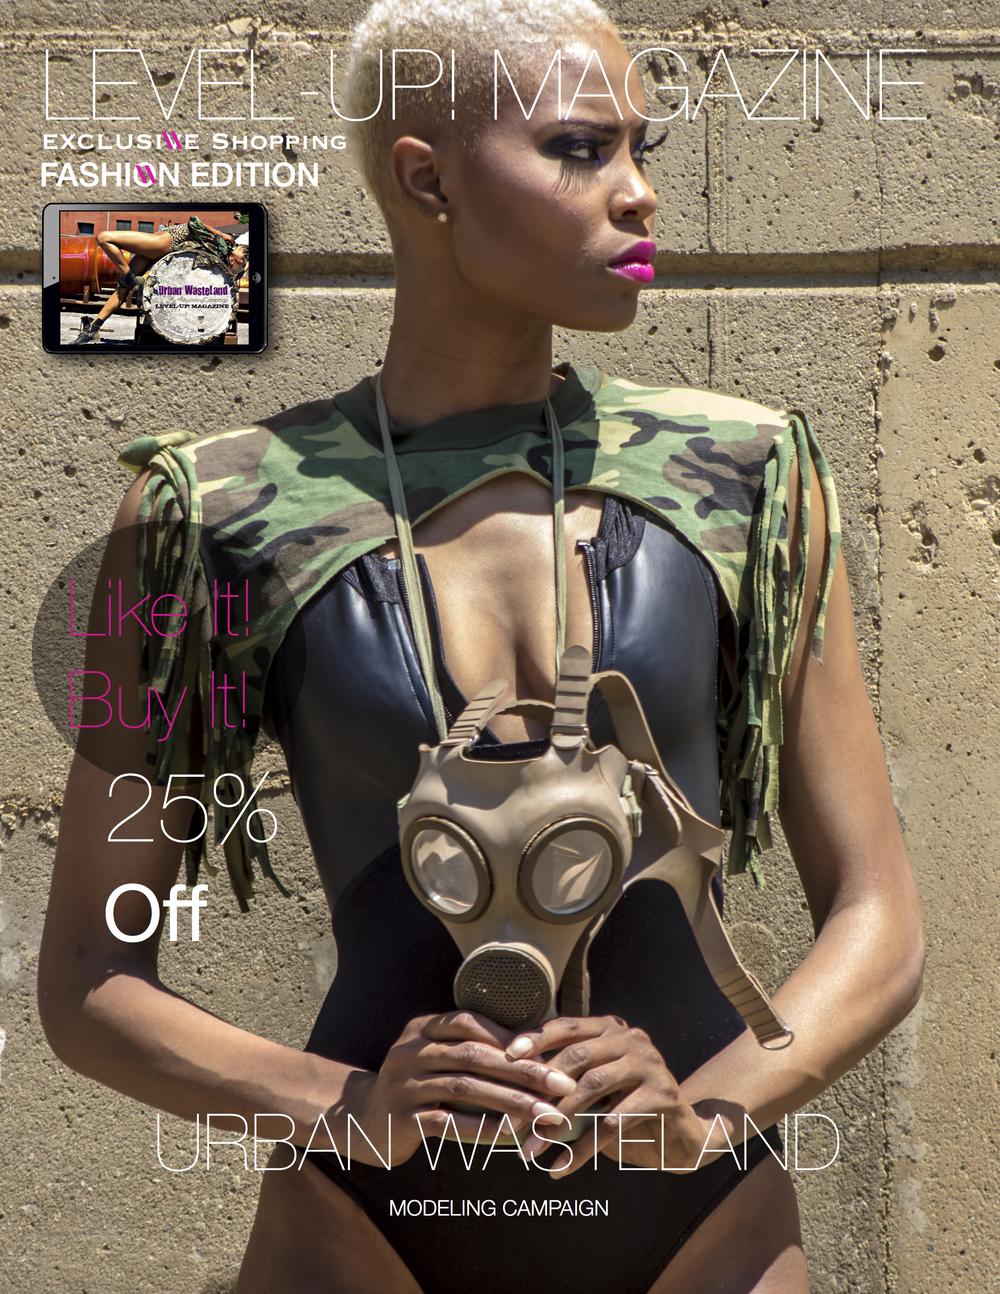 LeveL-Up! Magazine Fashion Edition Cover.jpg